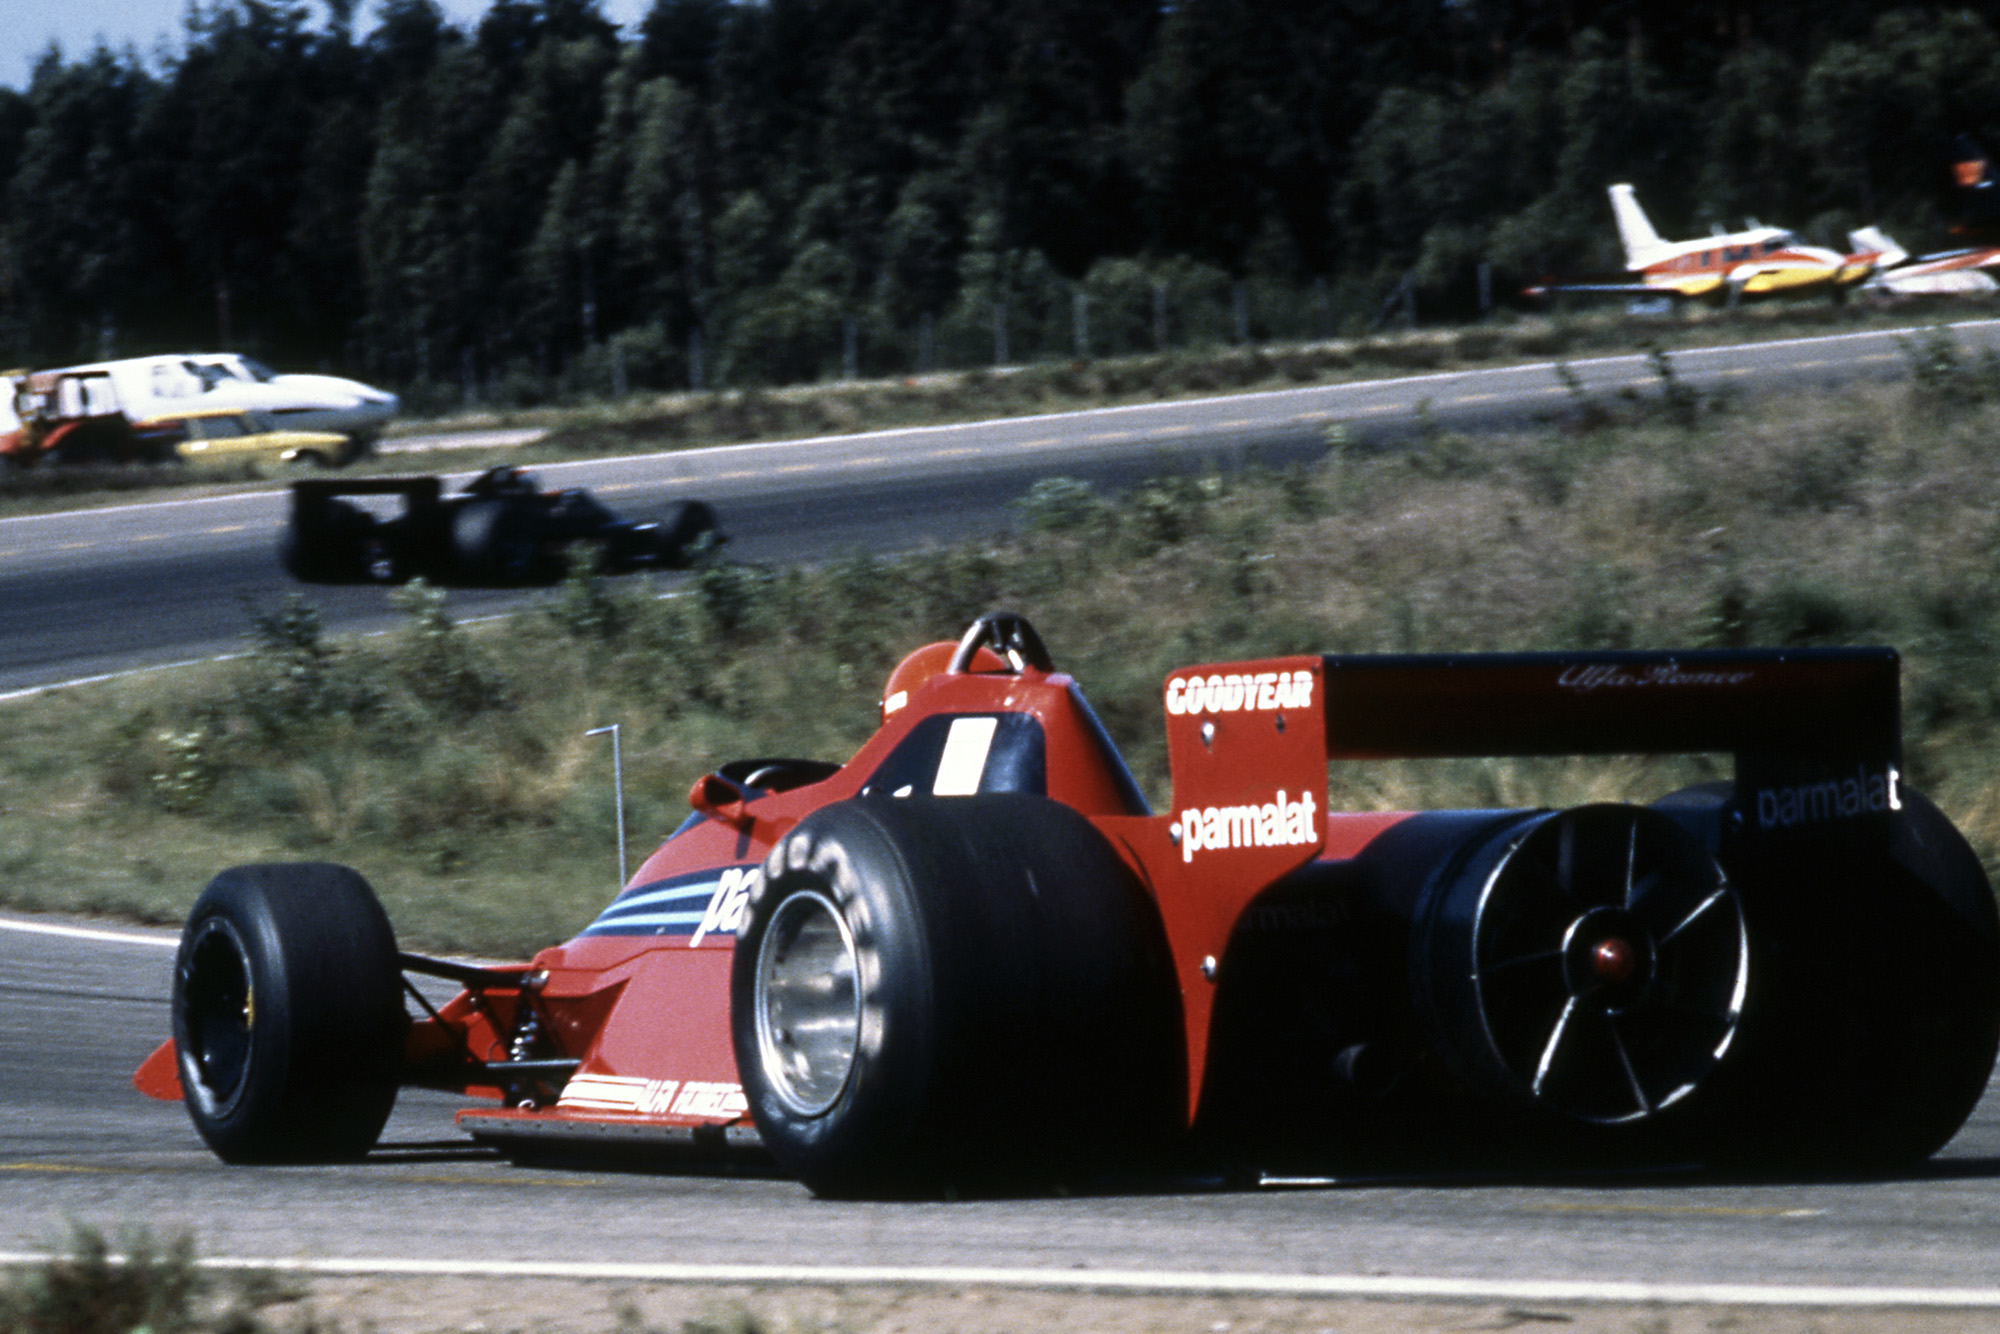 Rear shot of the Brabham fan car at the 1978 Swedish GP